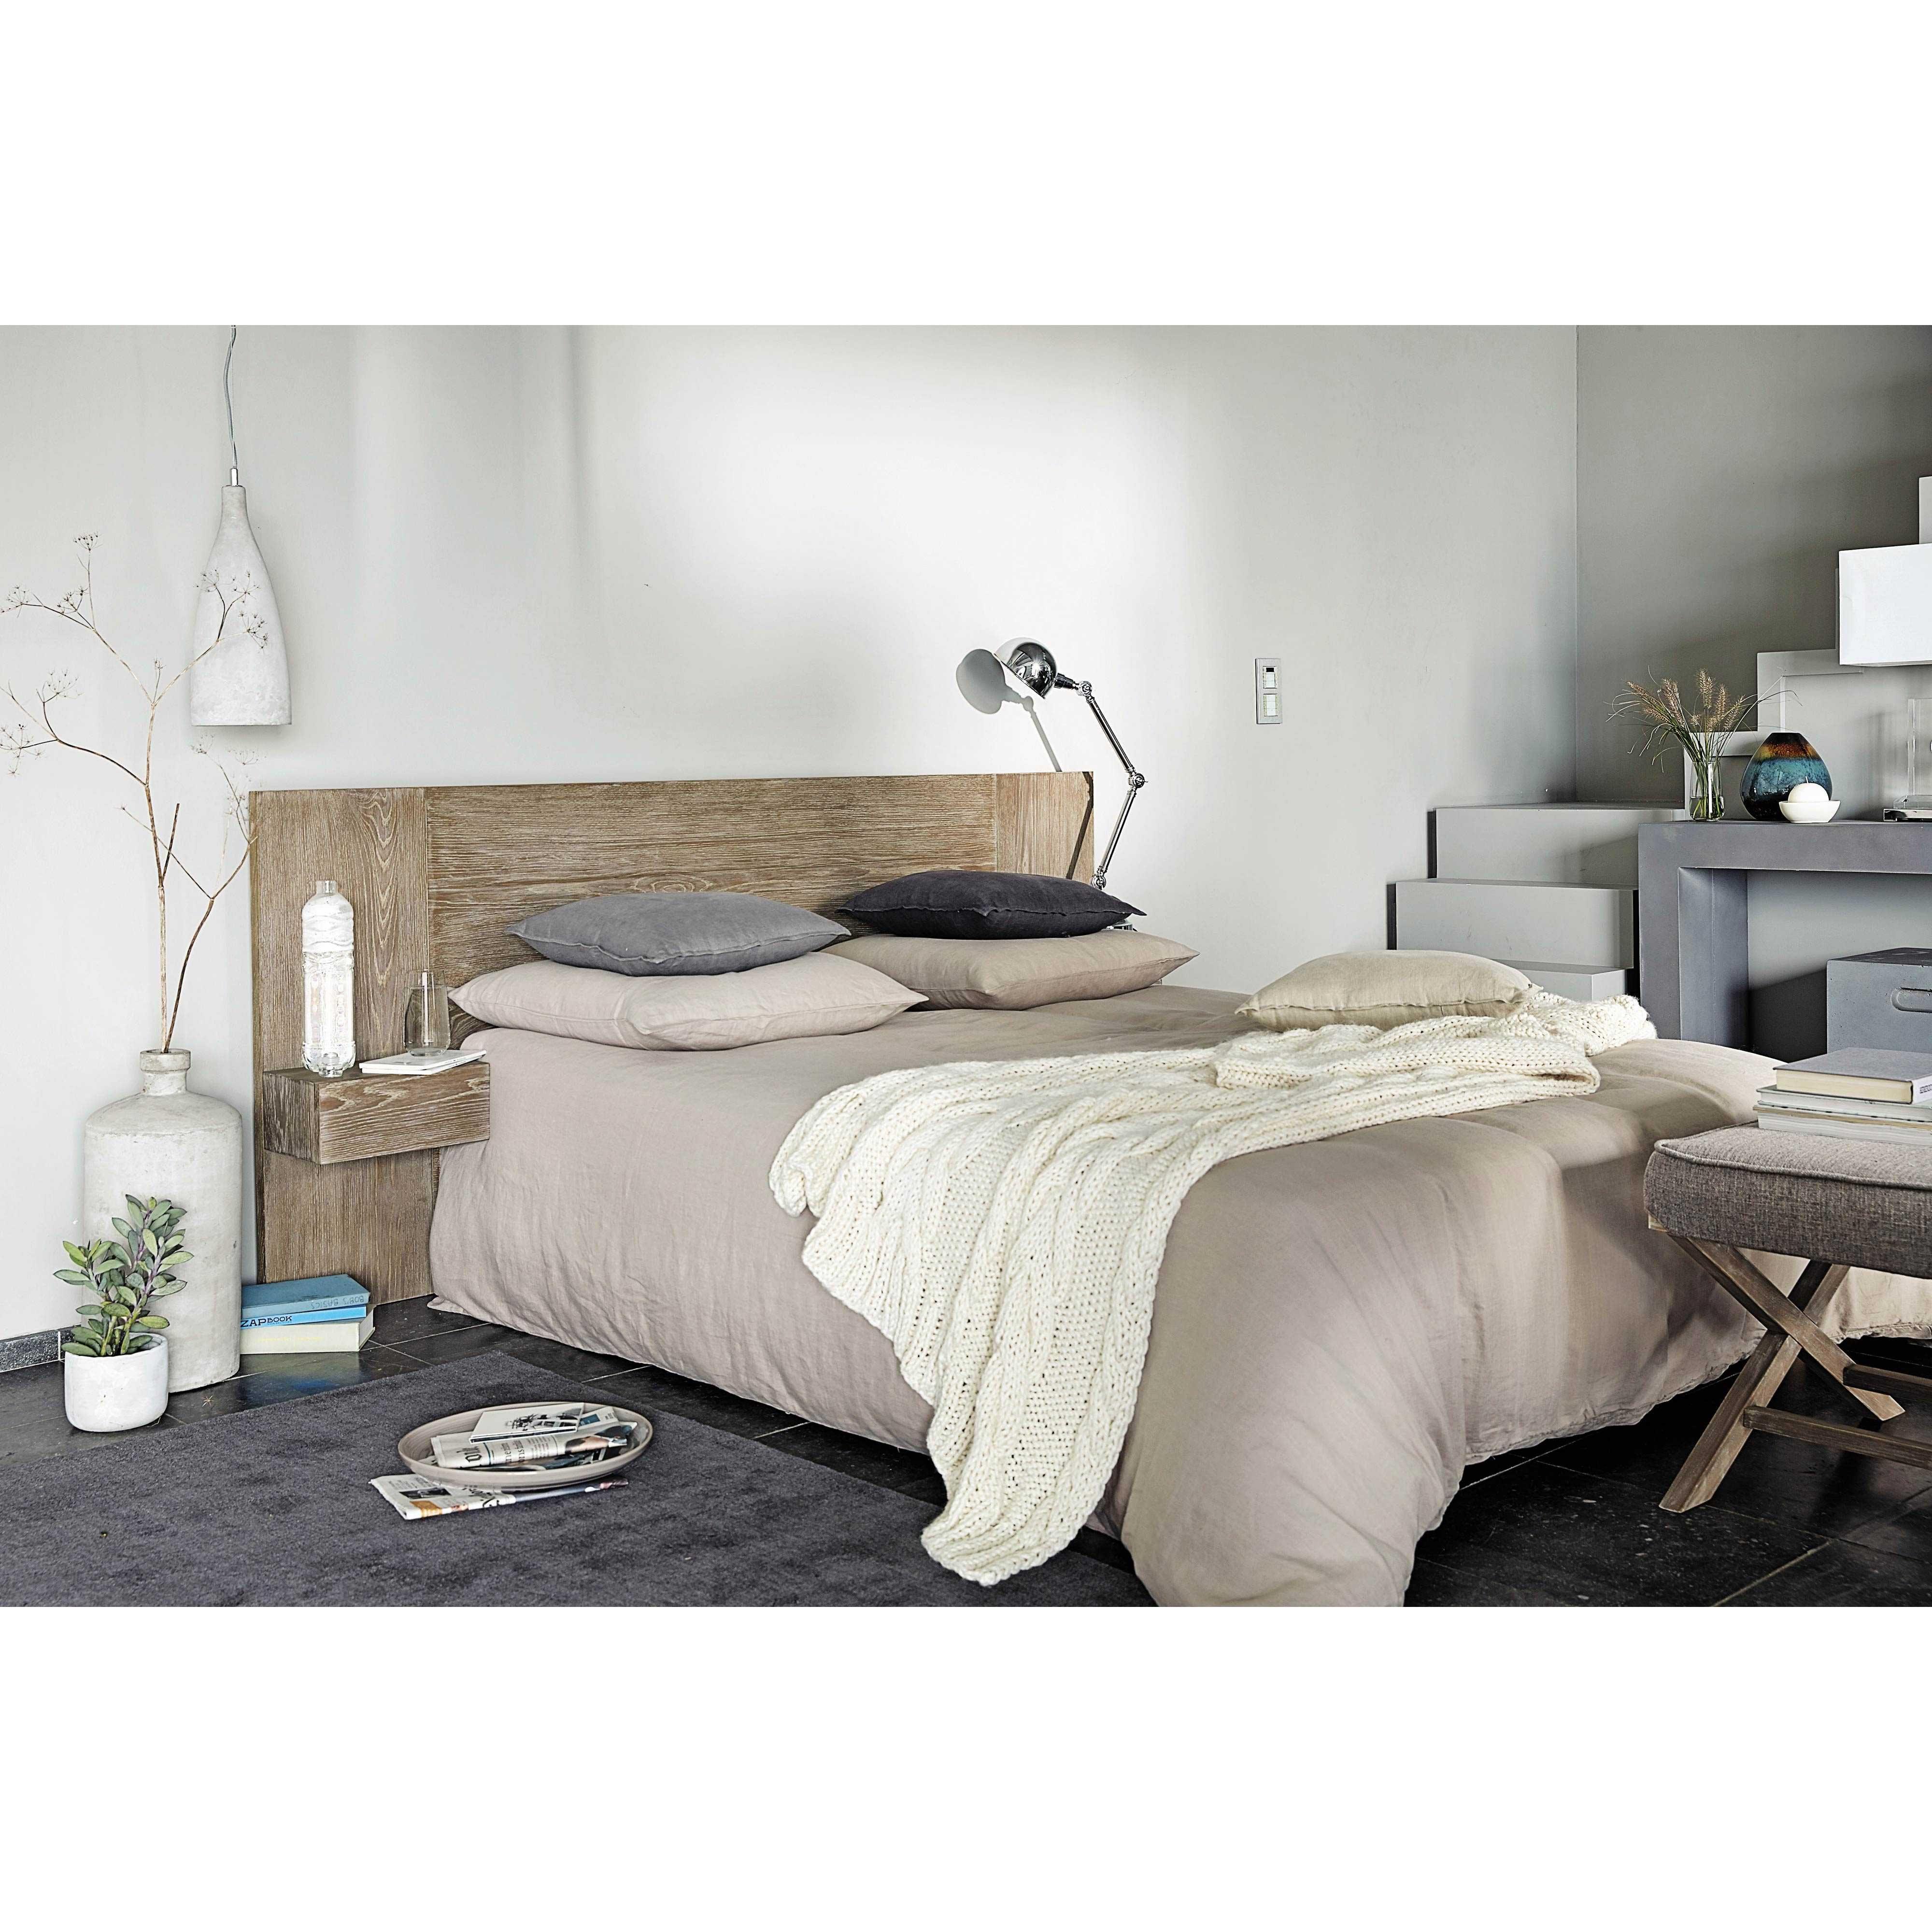 t te de lit 160 en 2018 inspiration a e chambre. Black Bedroom Furniture Sets. Home Design Ideas